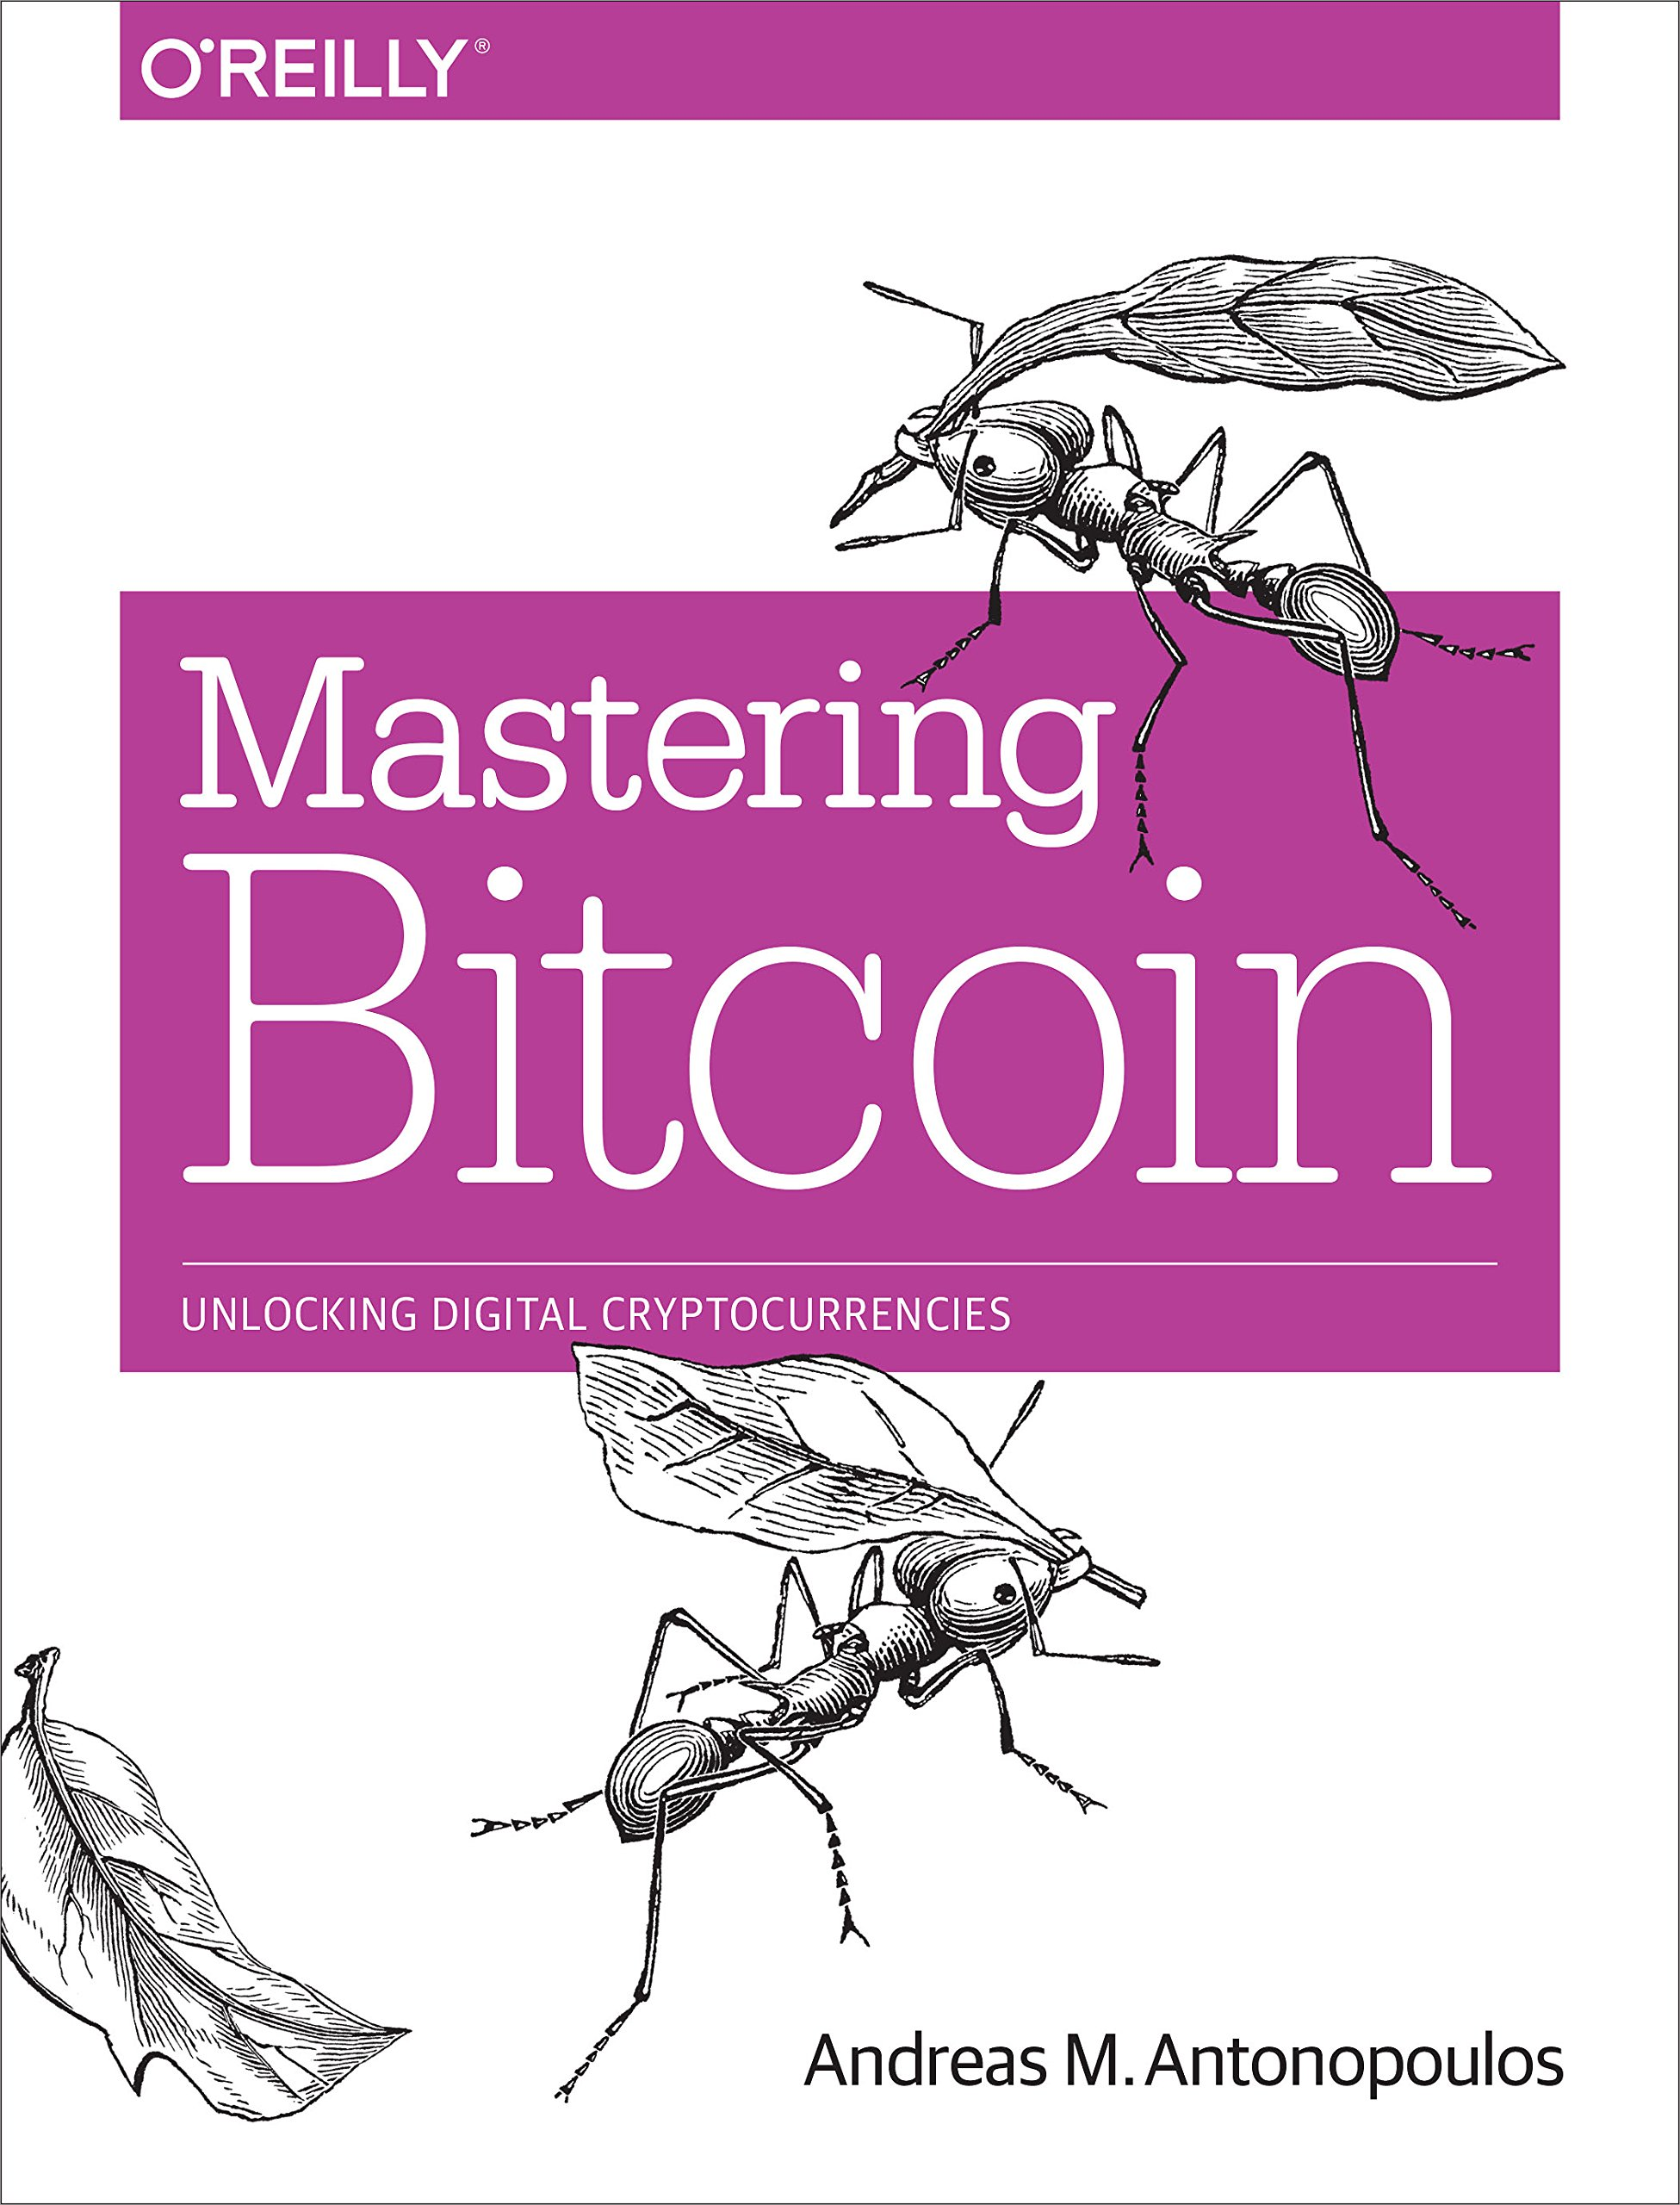 Mastering Bitcoin: Unlocking Digital Cryptocurrencies by O'Reilly Media